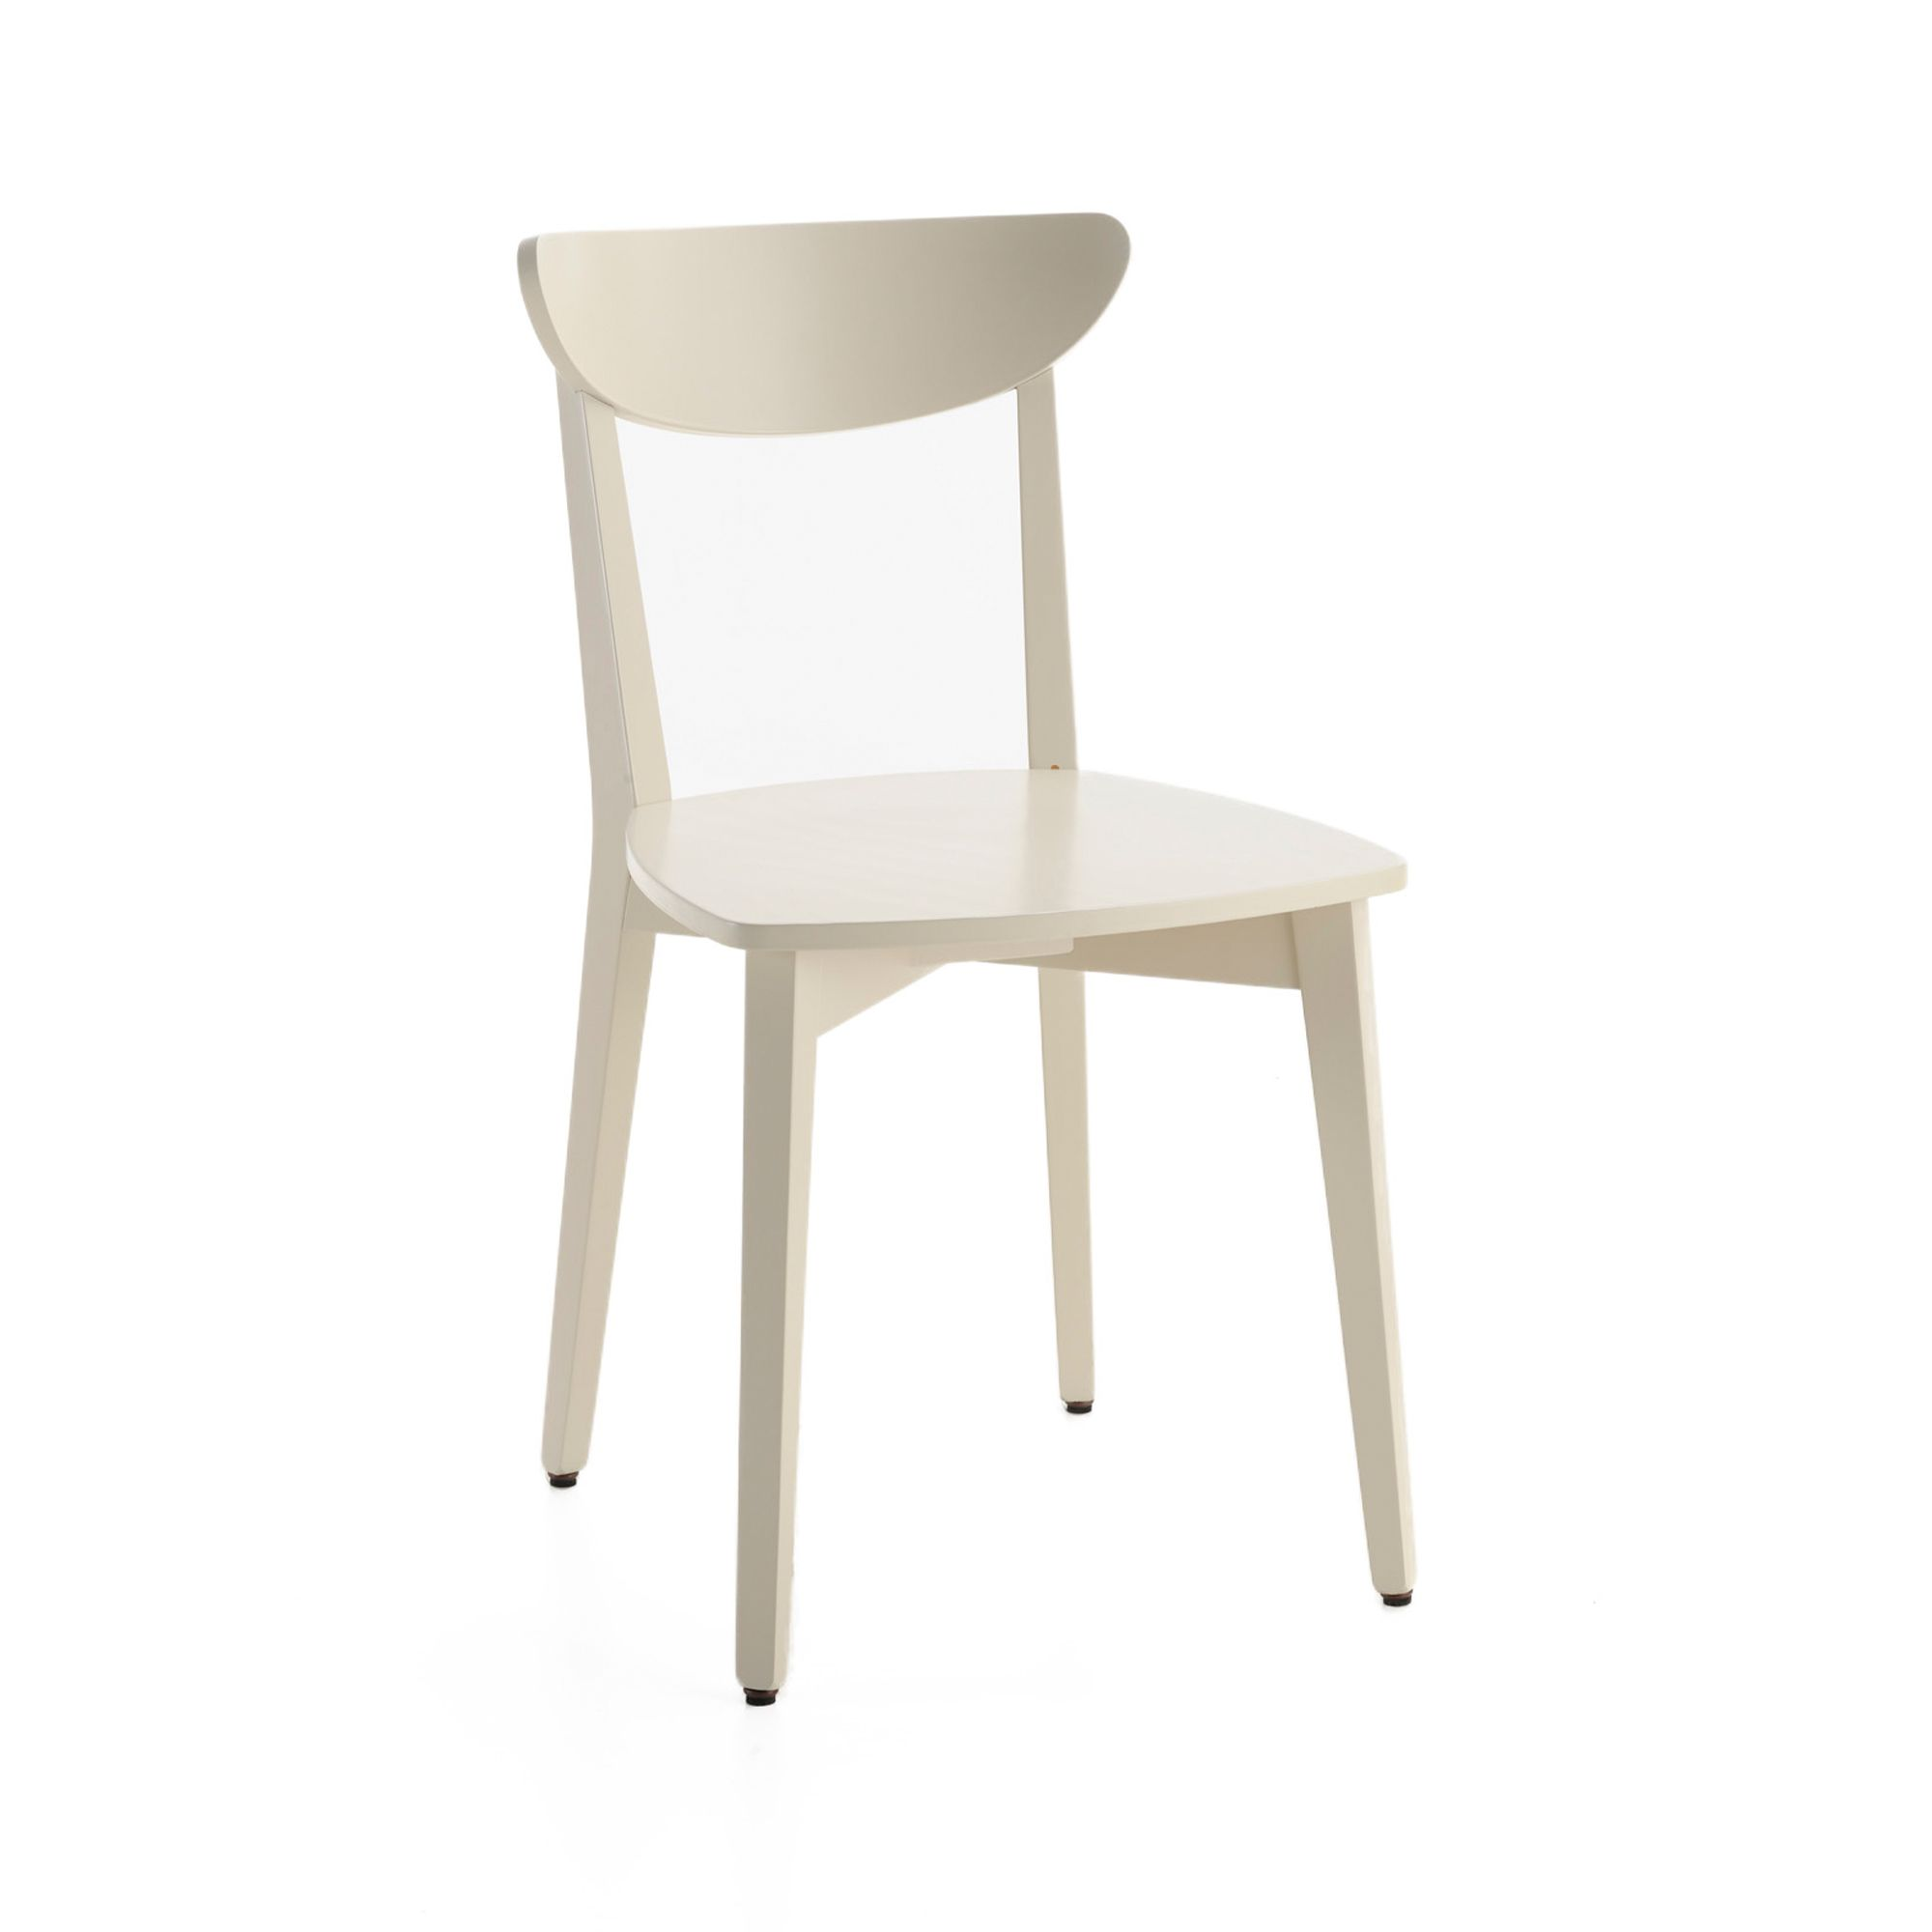 Model 871L chair in modern style